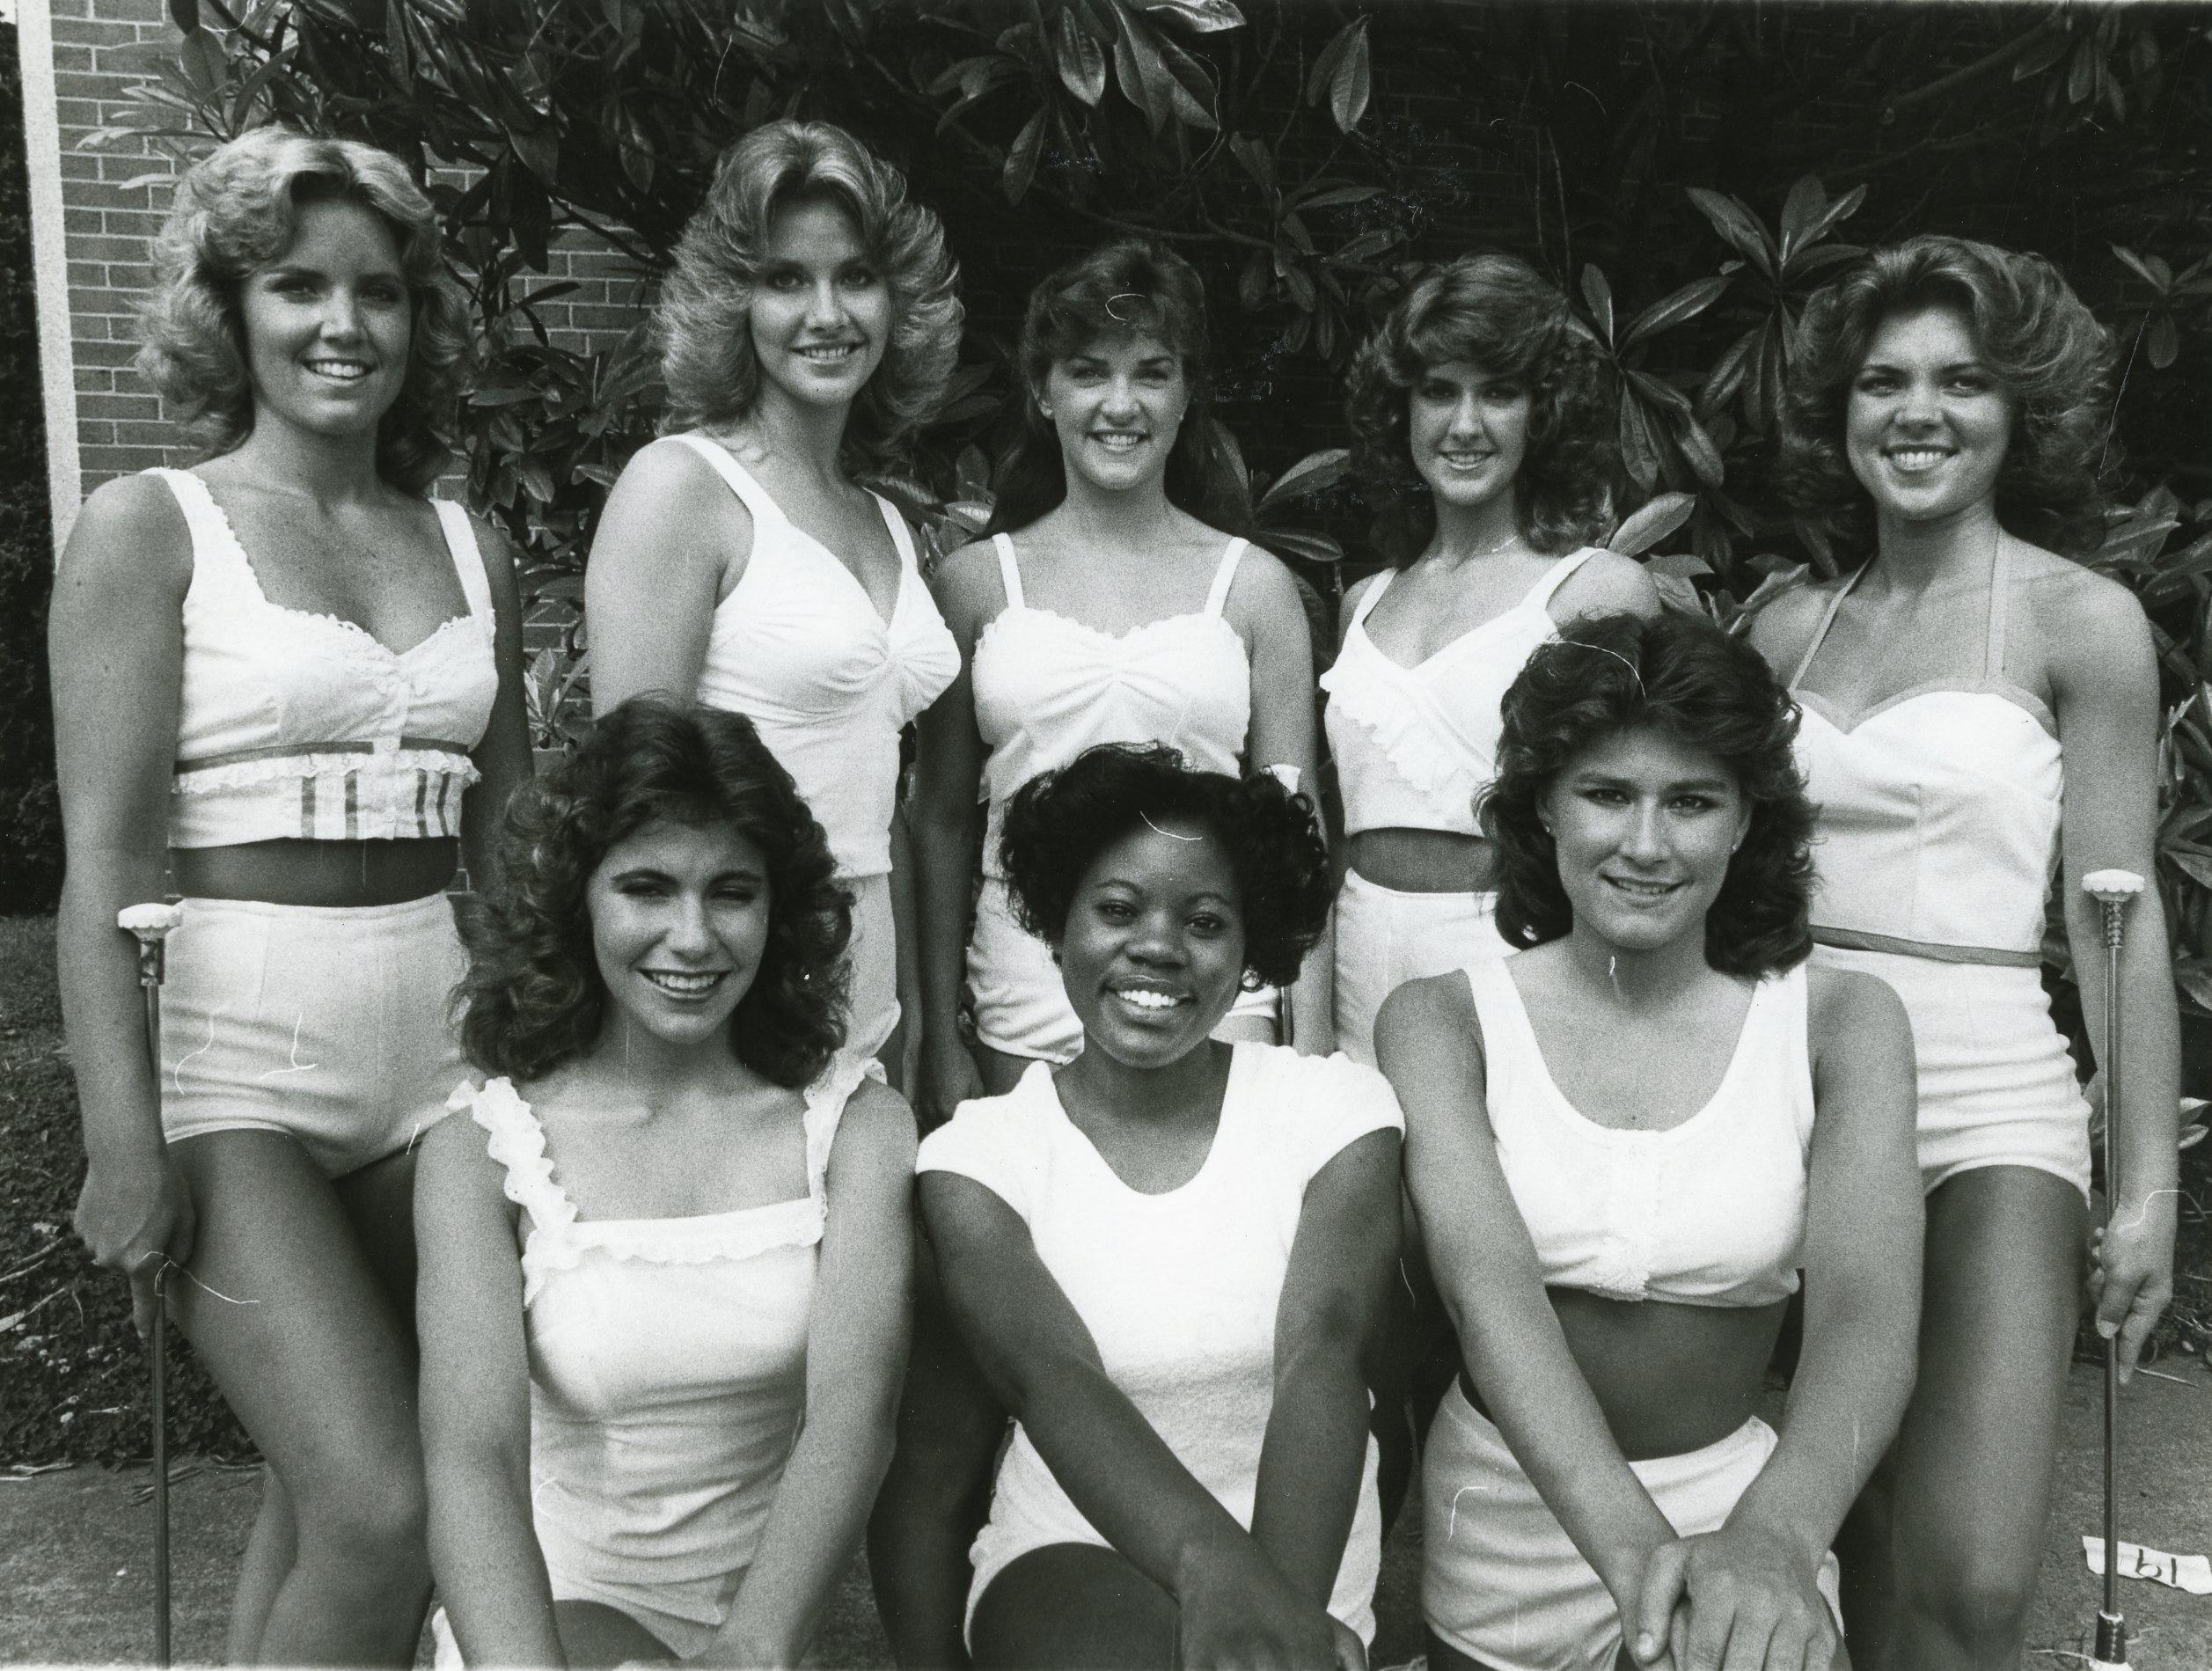 UT 1983 majorettes included (front) Leslie Murrell, Dawn James, Kenda Melton; (back) Rhonda Barker, Vicki Davis, Julie Watson, Aimee Wall and Leigh Ann Gammon.